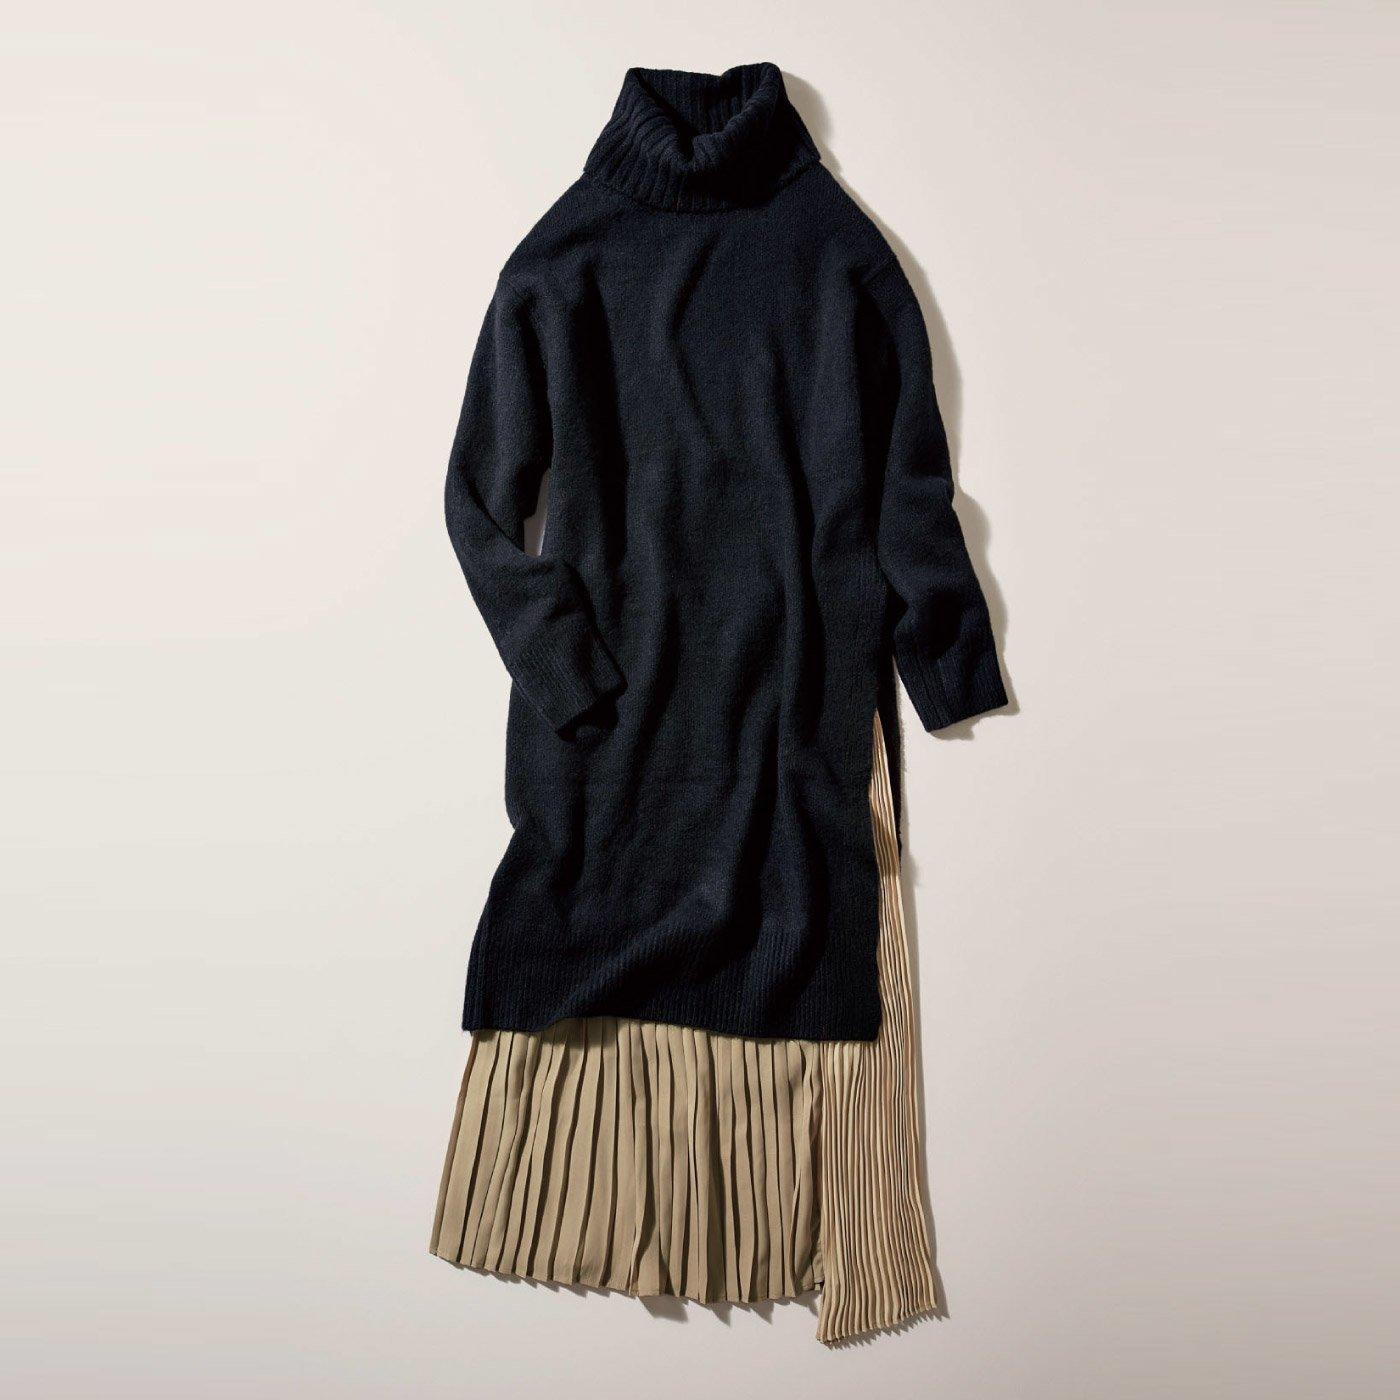 IEDIT[イディット] 小森美穂子さんとコラボ 旬のロング&ロングの着こなしに簡単チャレンジ タートルロングニットと異素材プリーツスカートのコーデセット〈ブラック〉